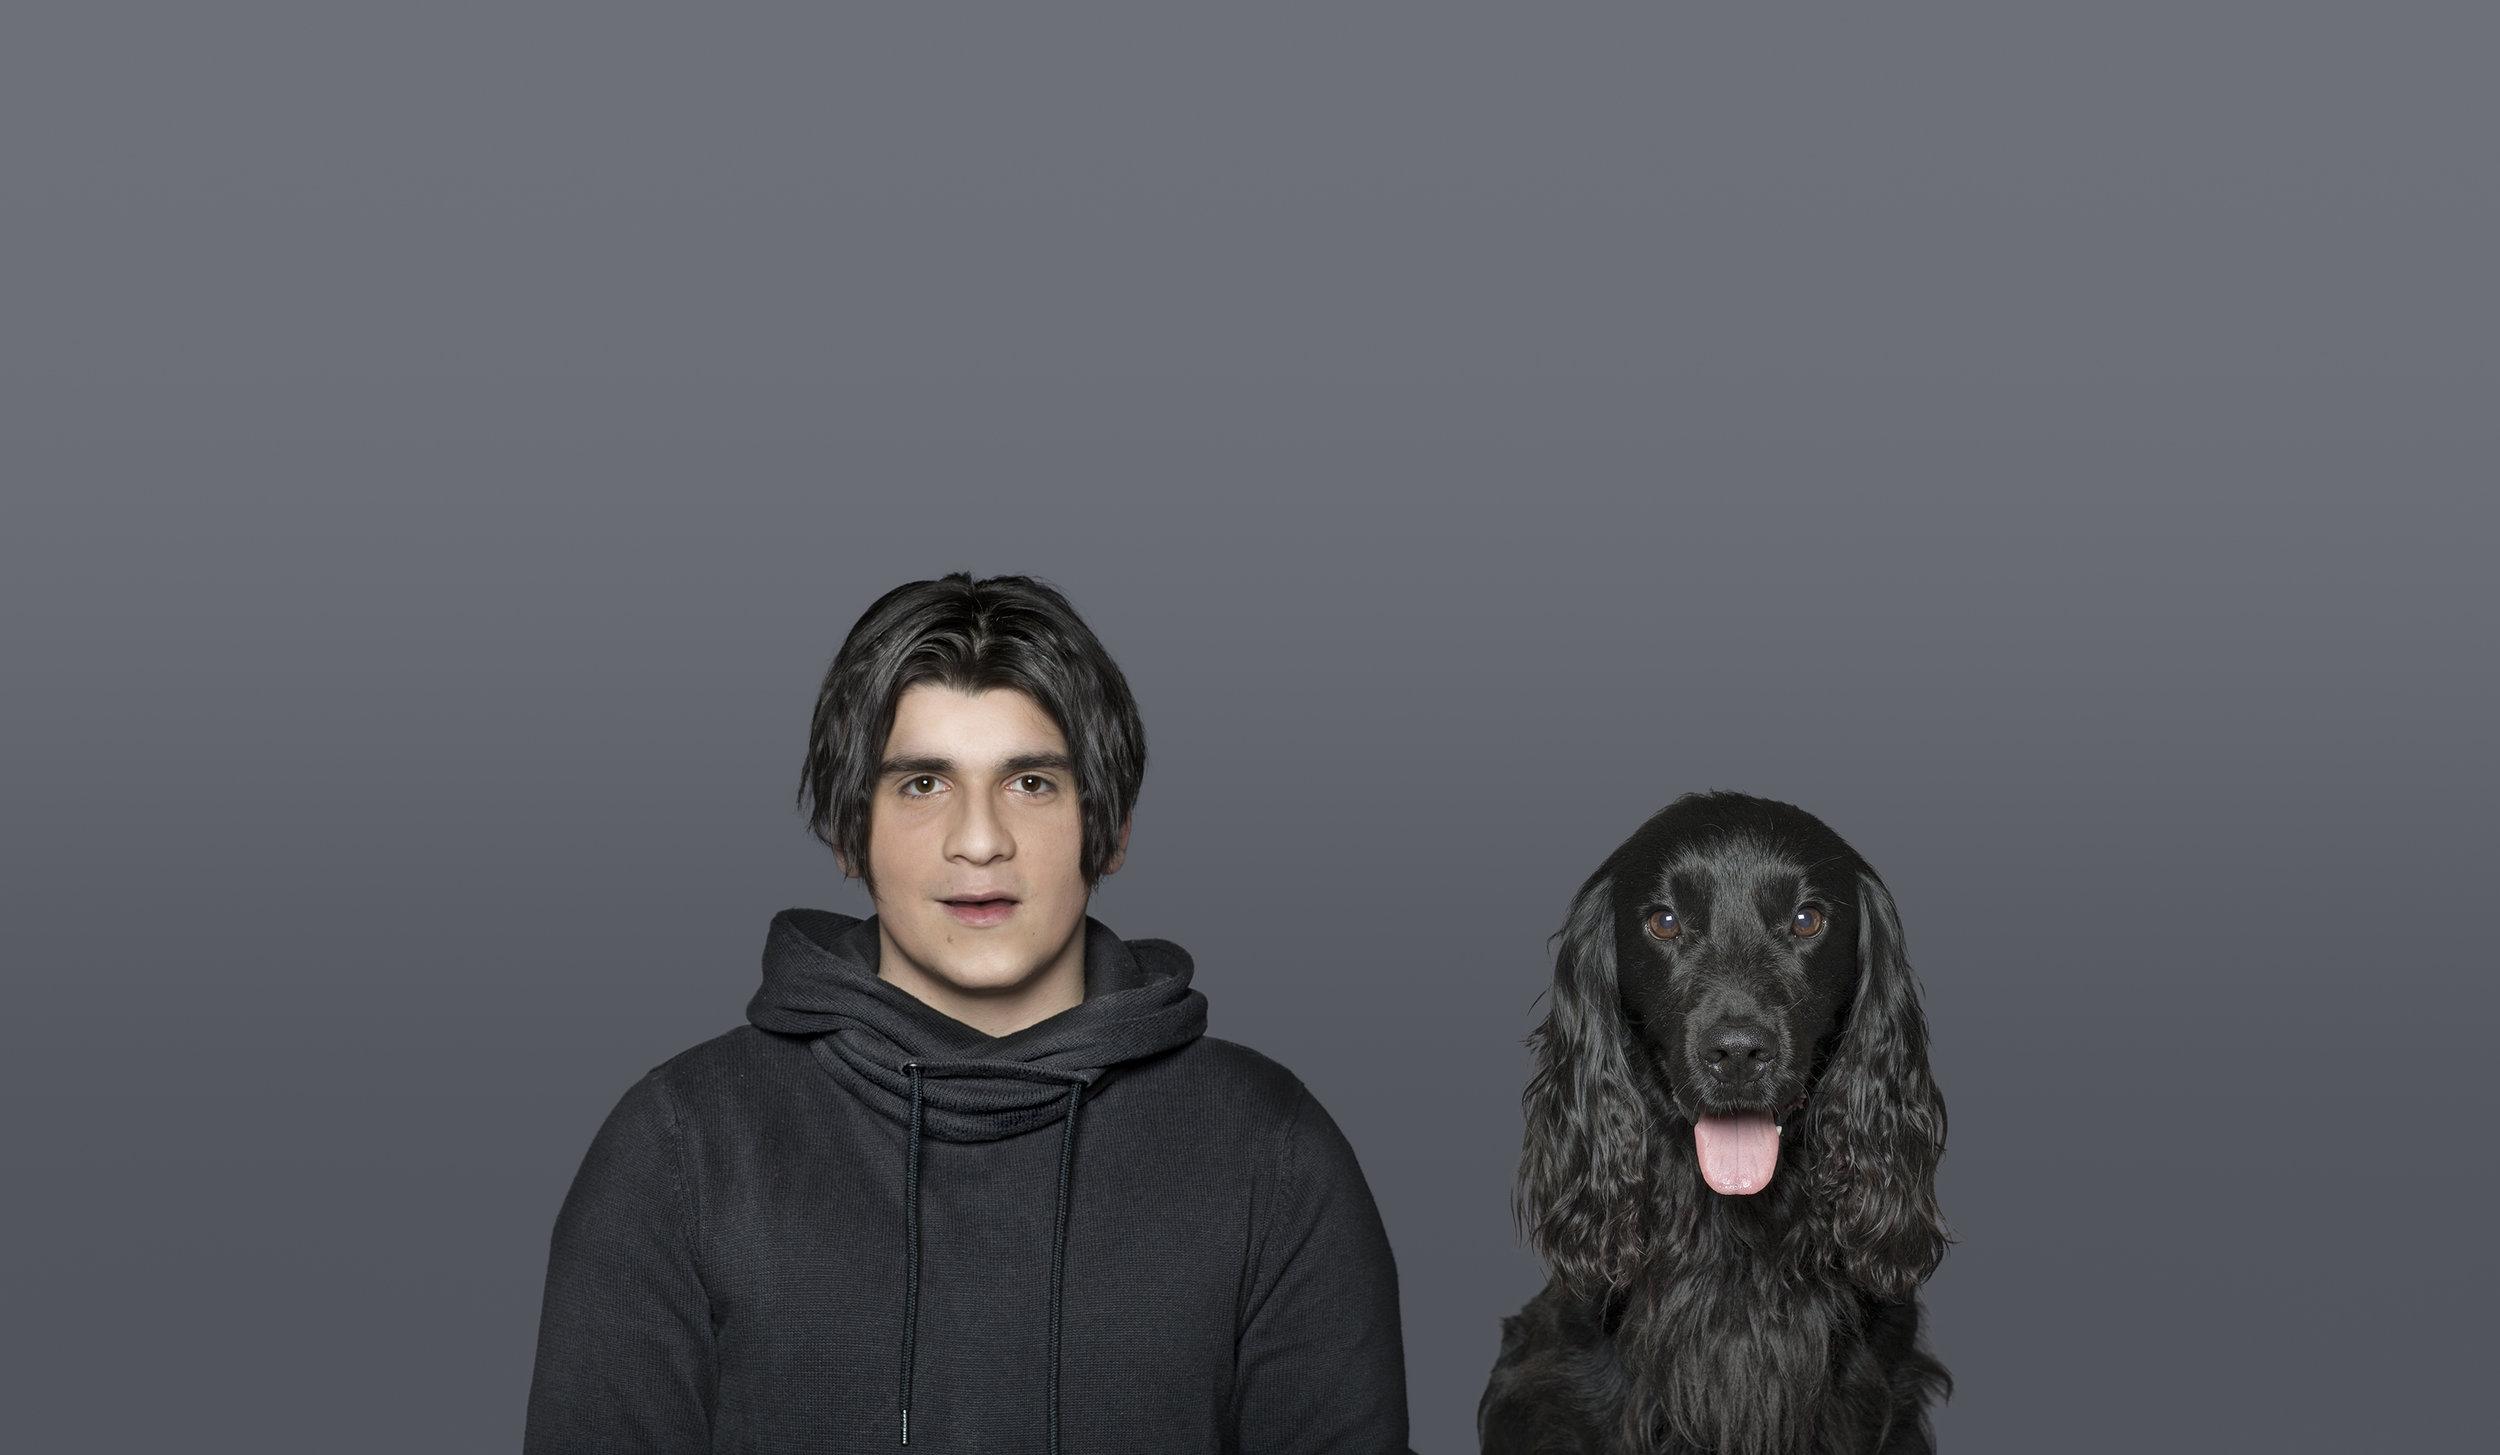 MR GENE_GENE_Pets and owners_04A3_rgb.jpg